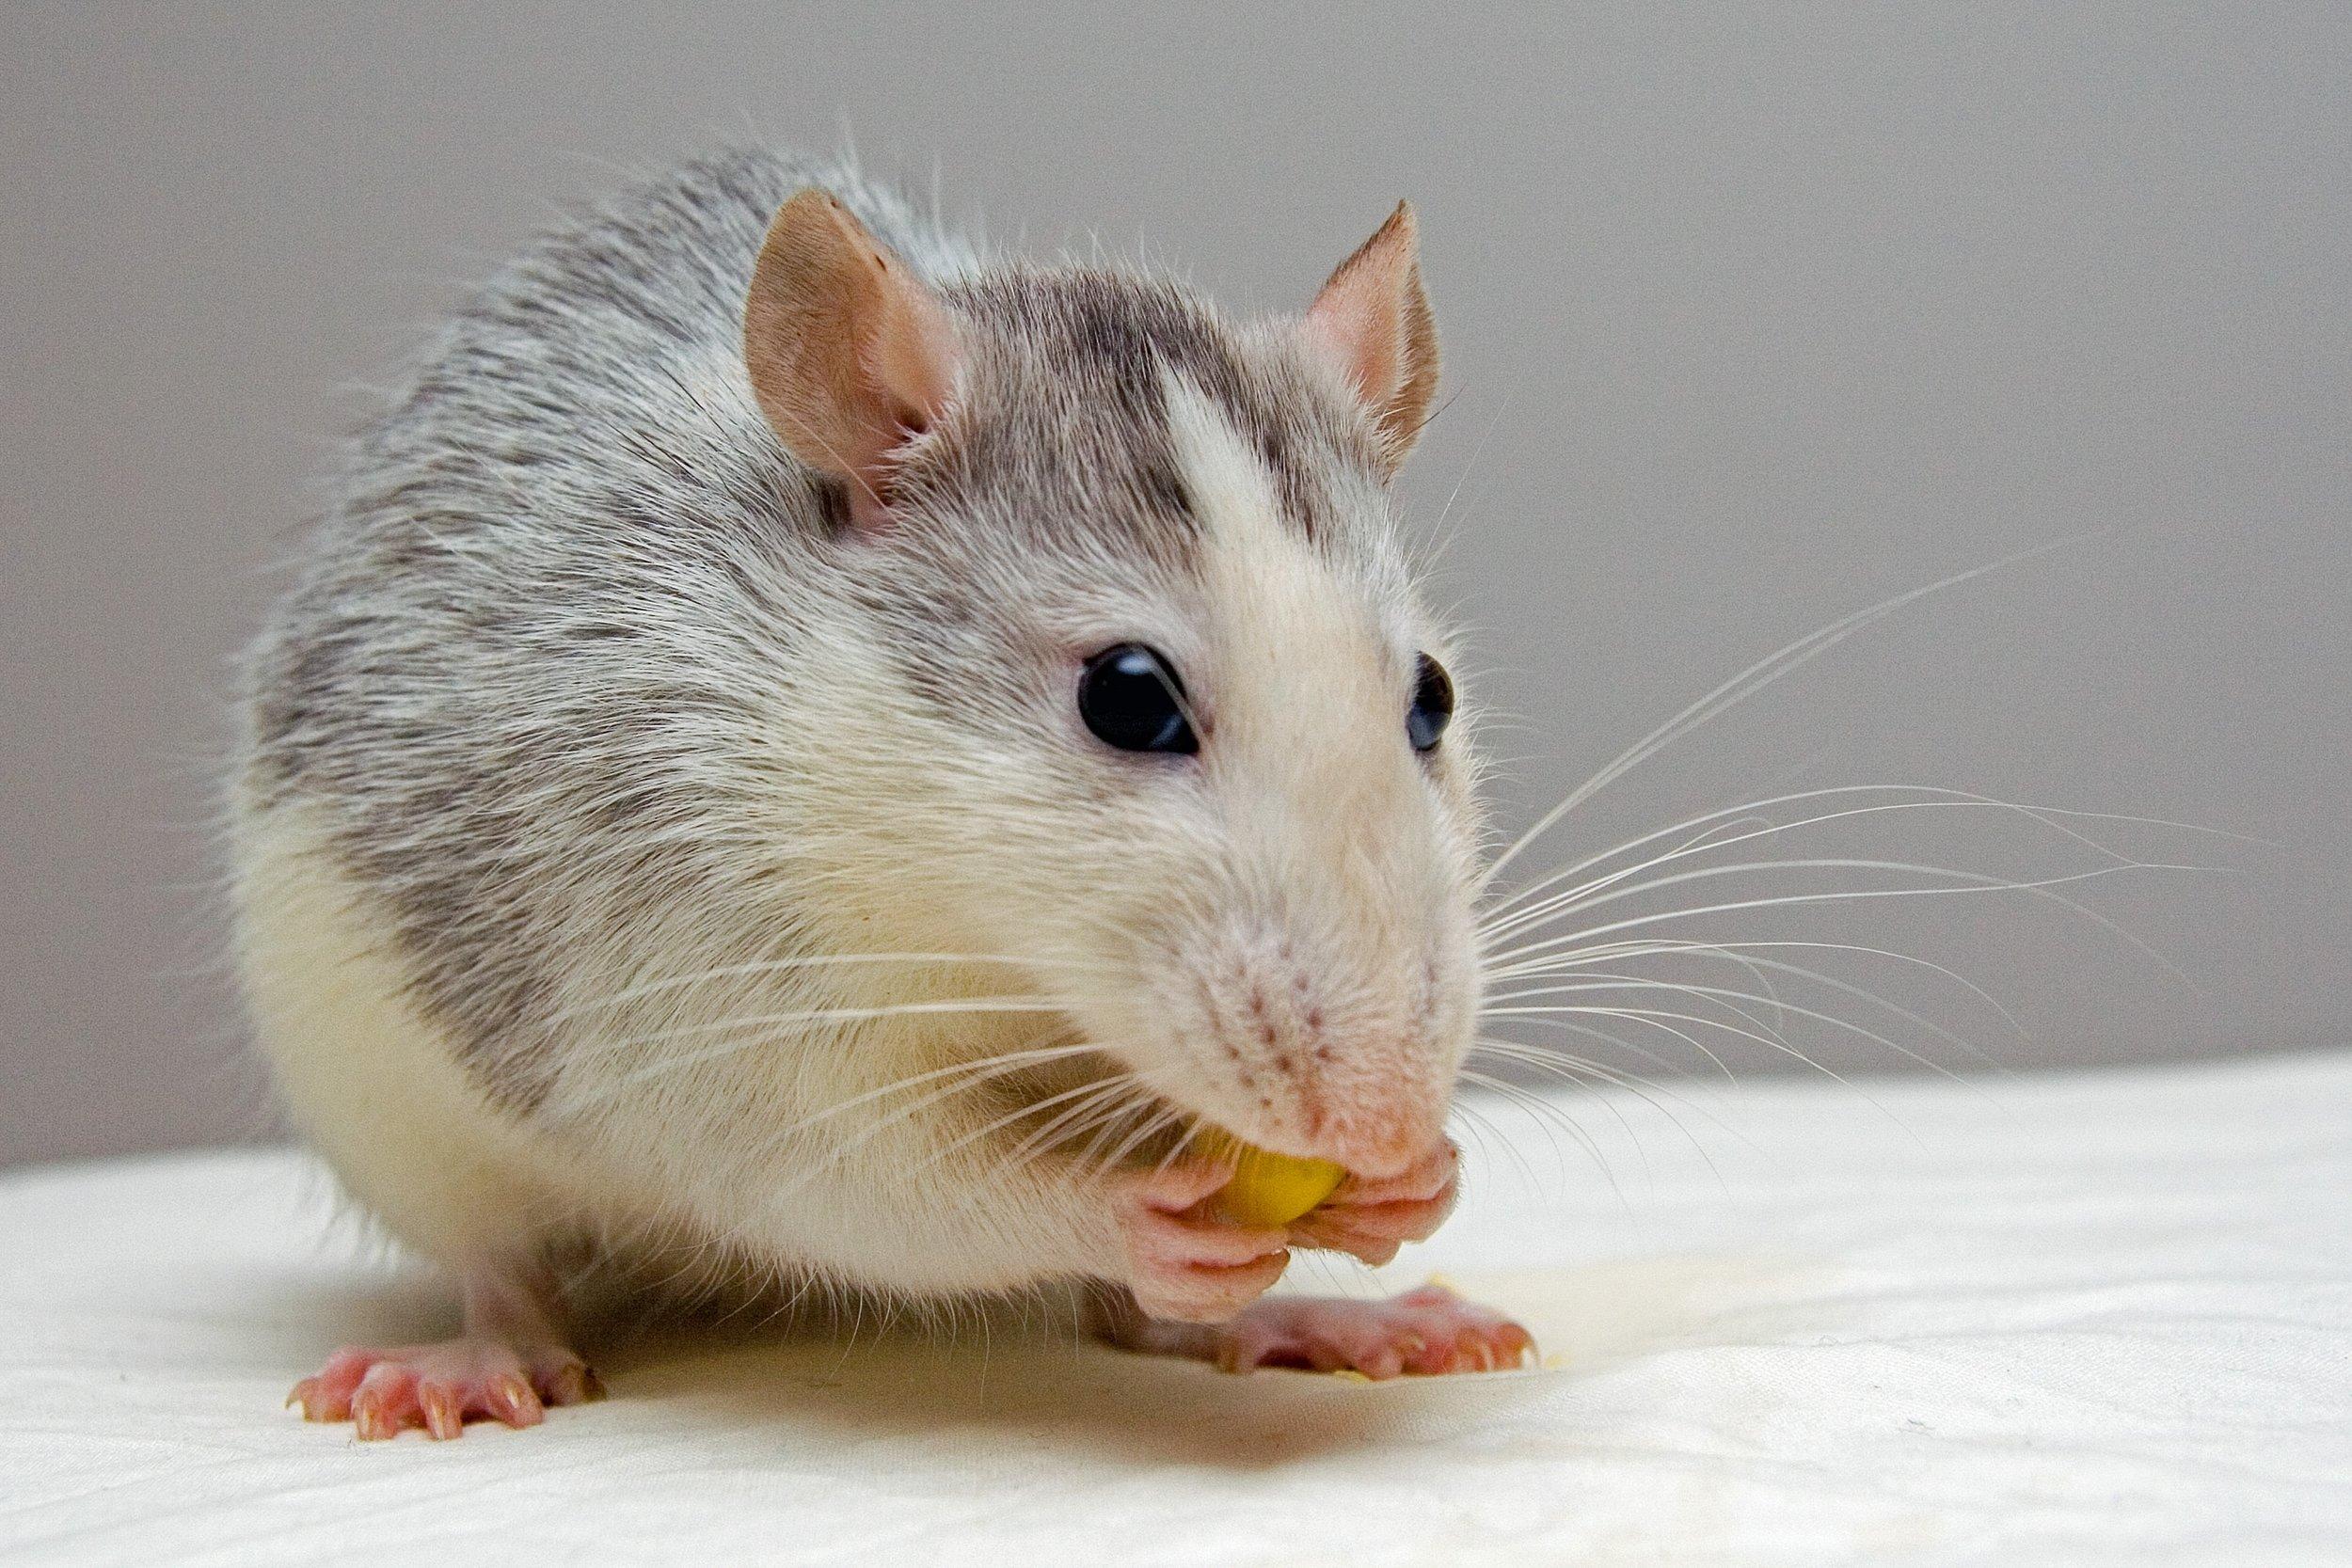 rodent.jpeg